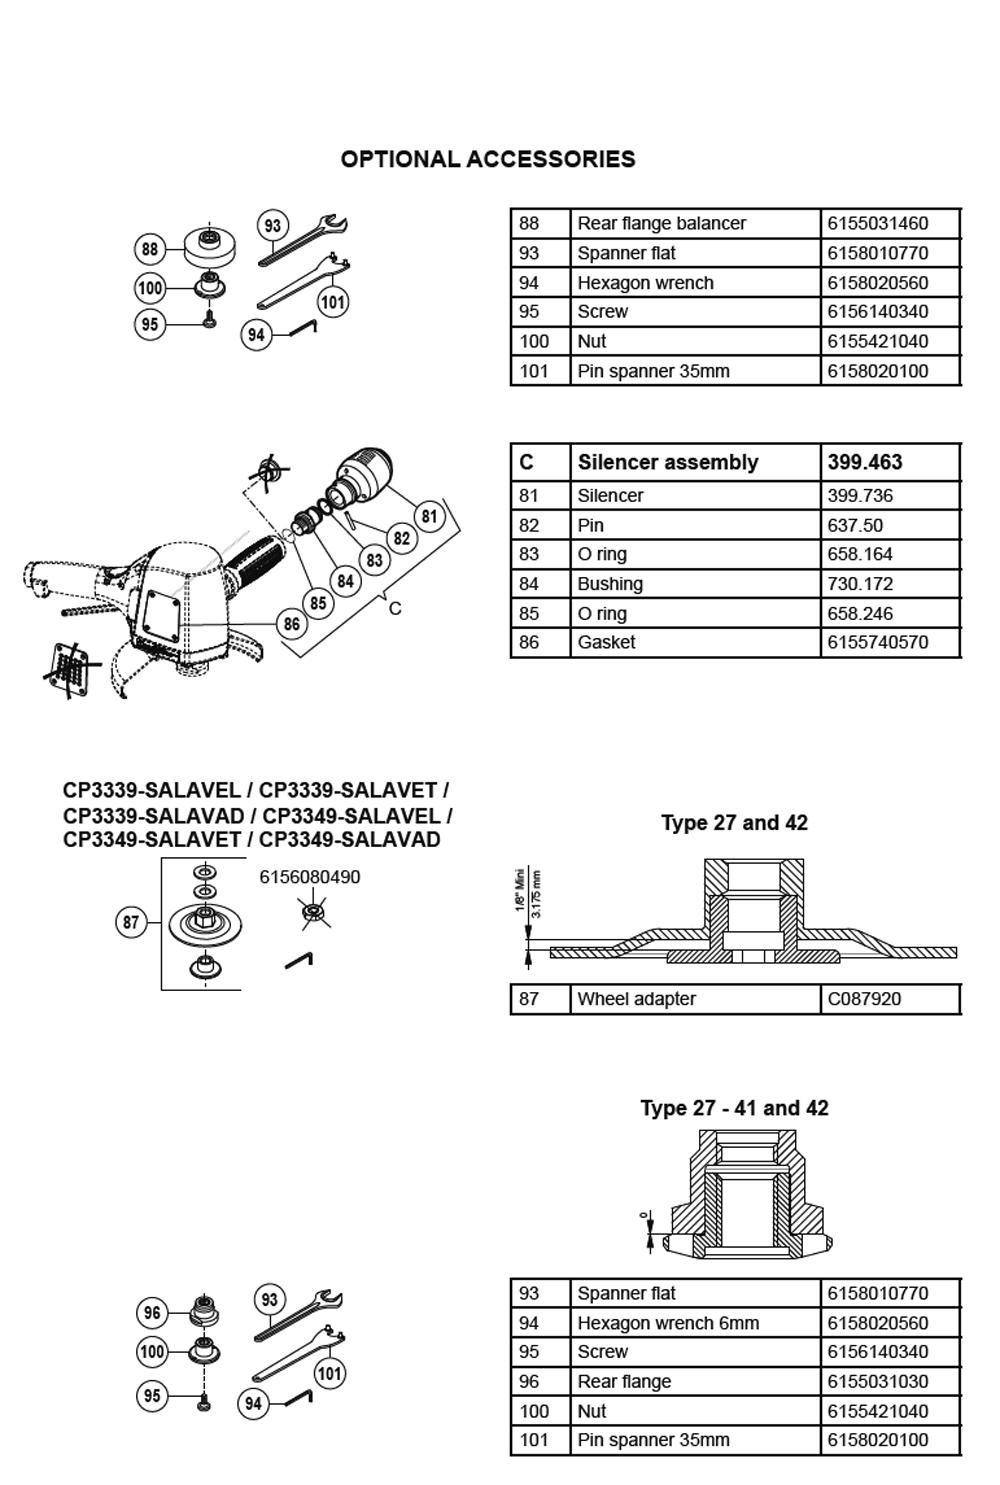 CP3339-SALAVADE-chicago-PB-7Break Down